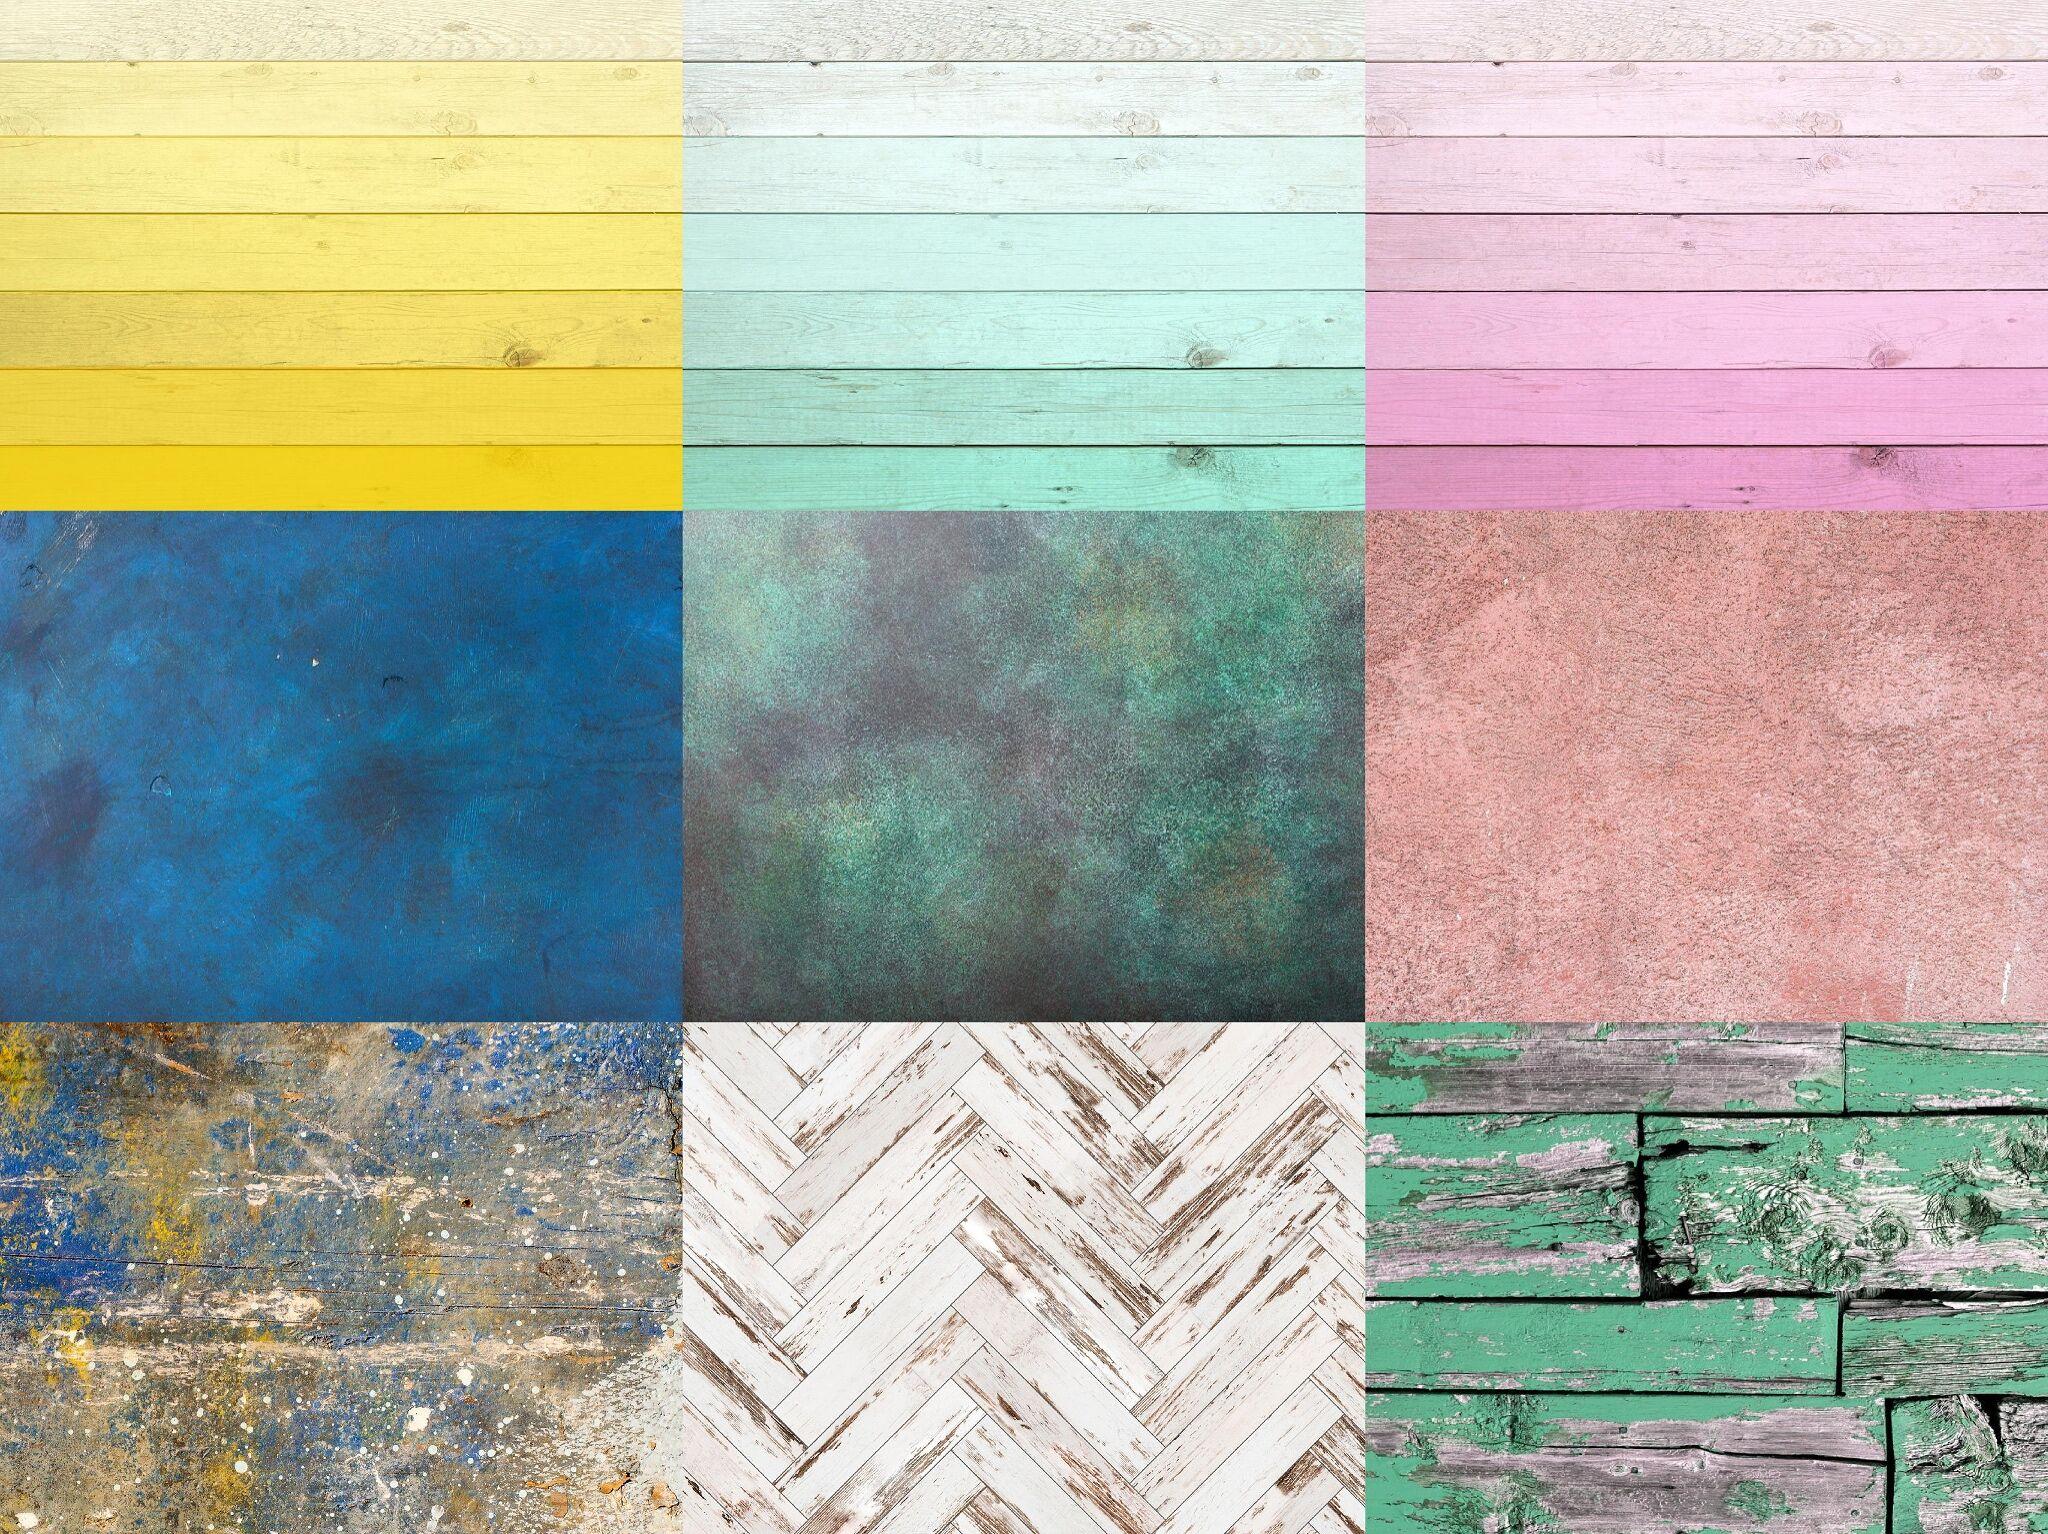 Floordrop ombre rosa madeira fotografia pano de fundo turqouise esponja pintado luz marrom retro recém-nascido de madeira fundo fotografia